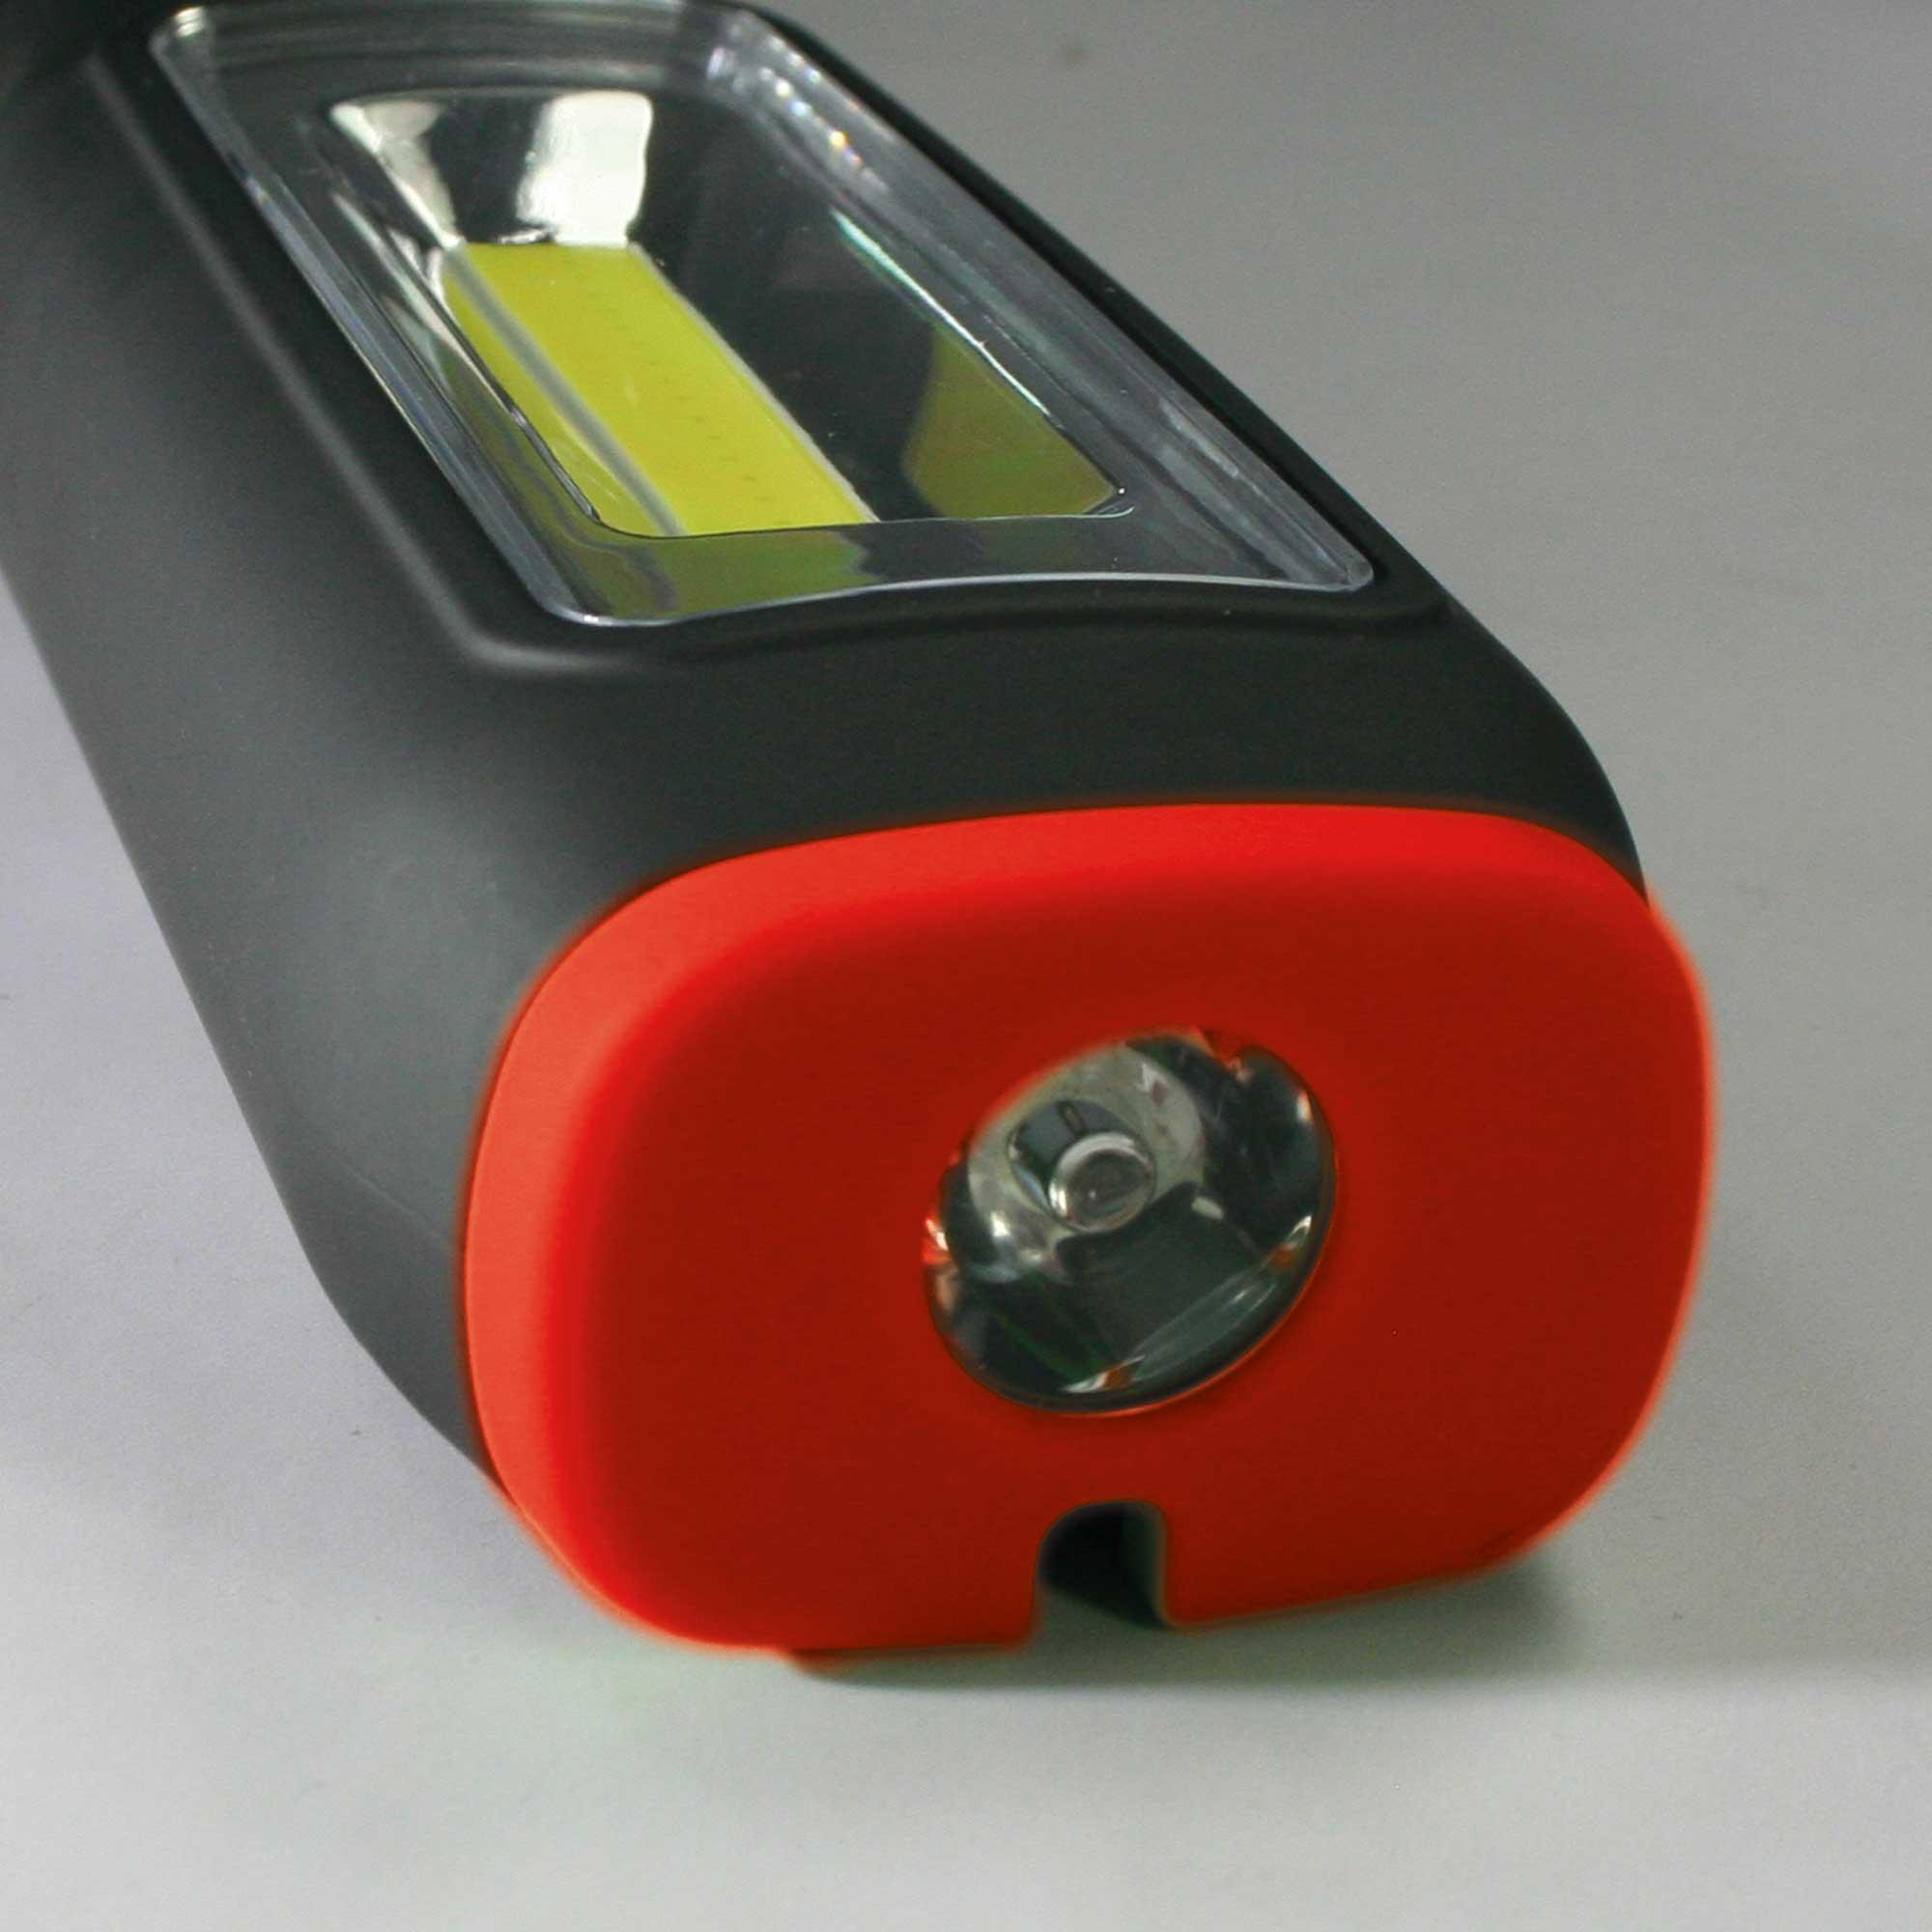 Handlampe 3W COB + 1W LED Arbeitslampe